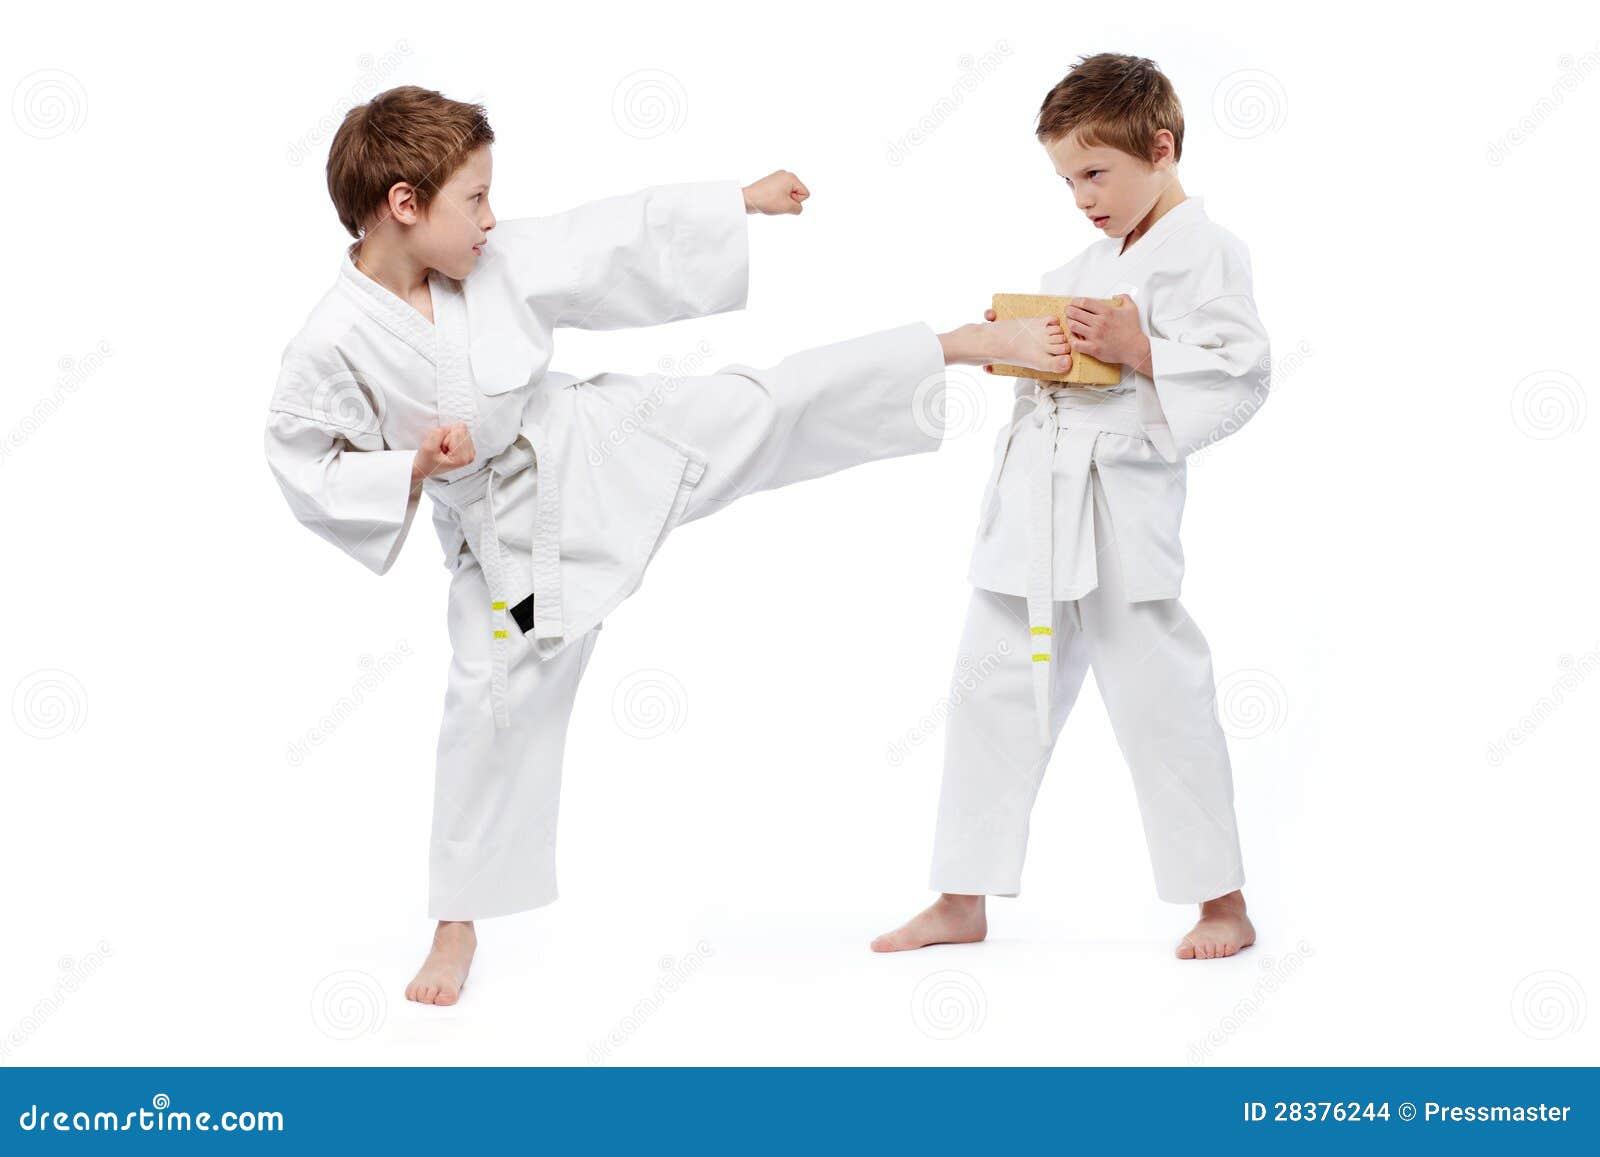 Kids Karate Roanoke Va